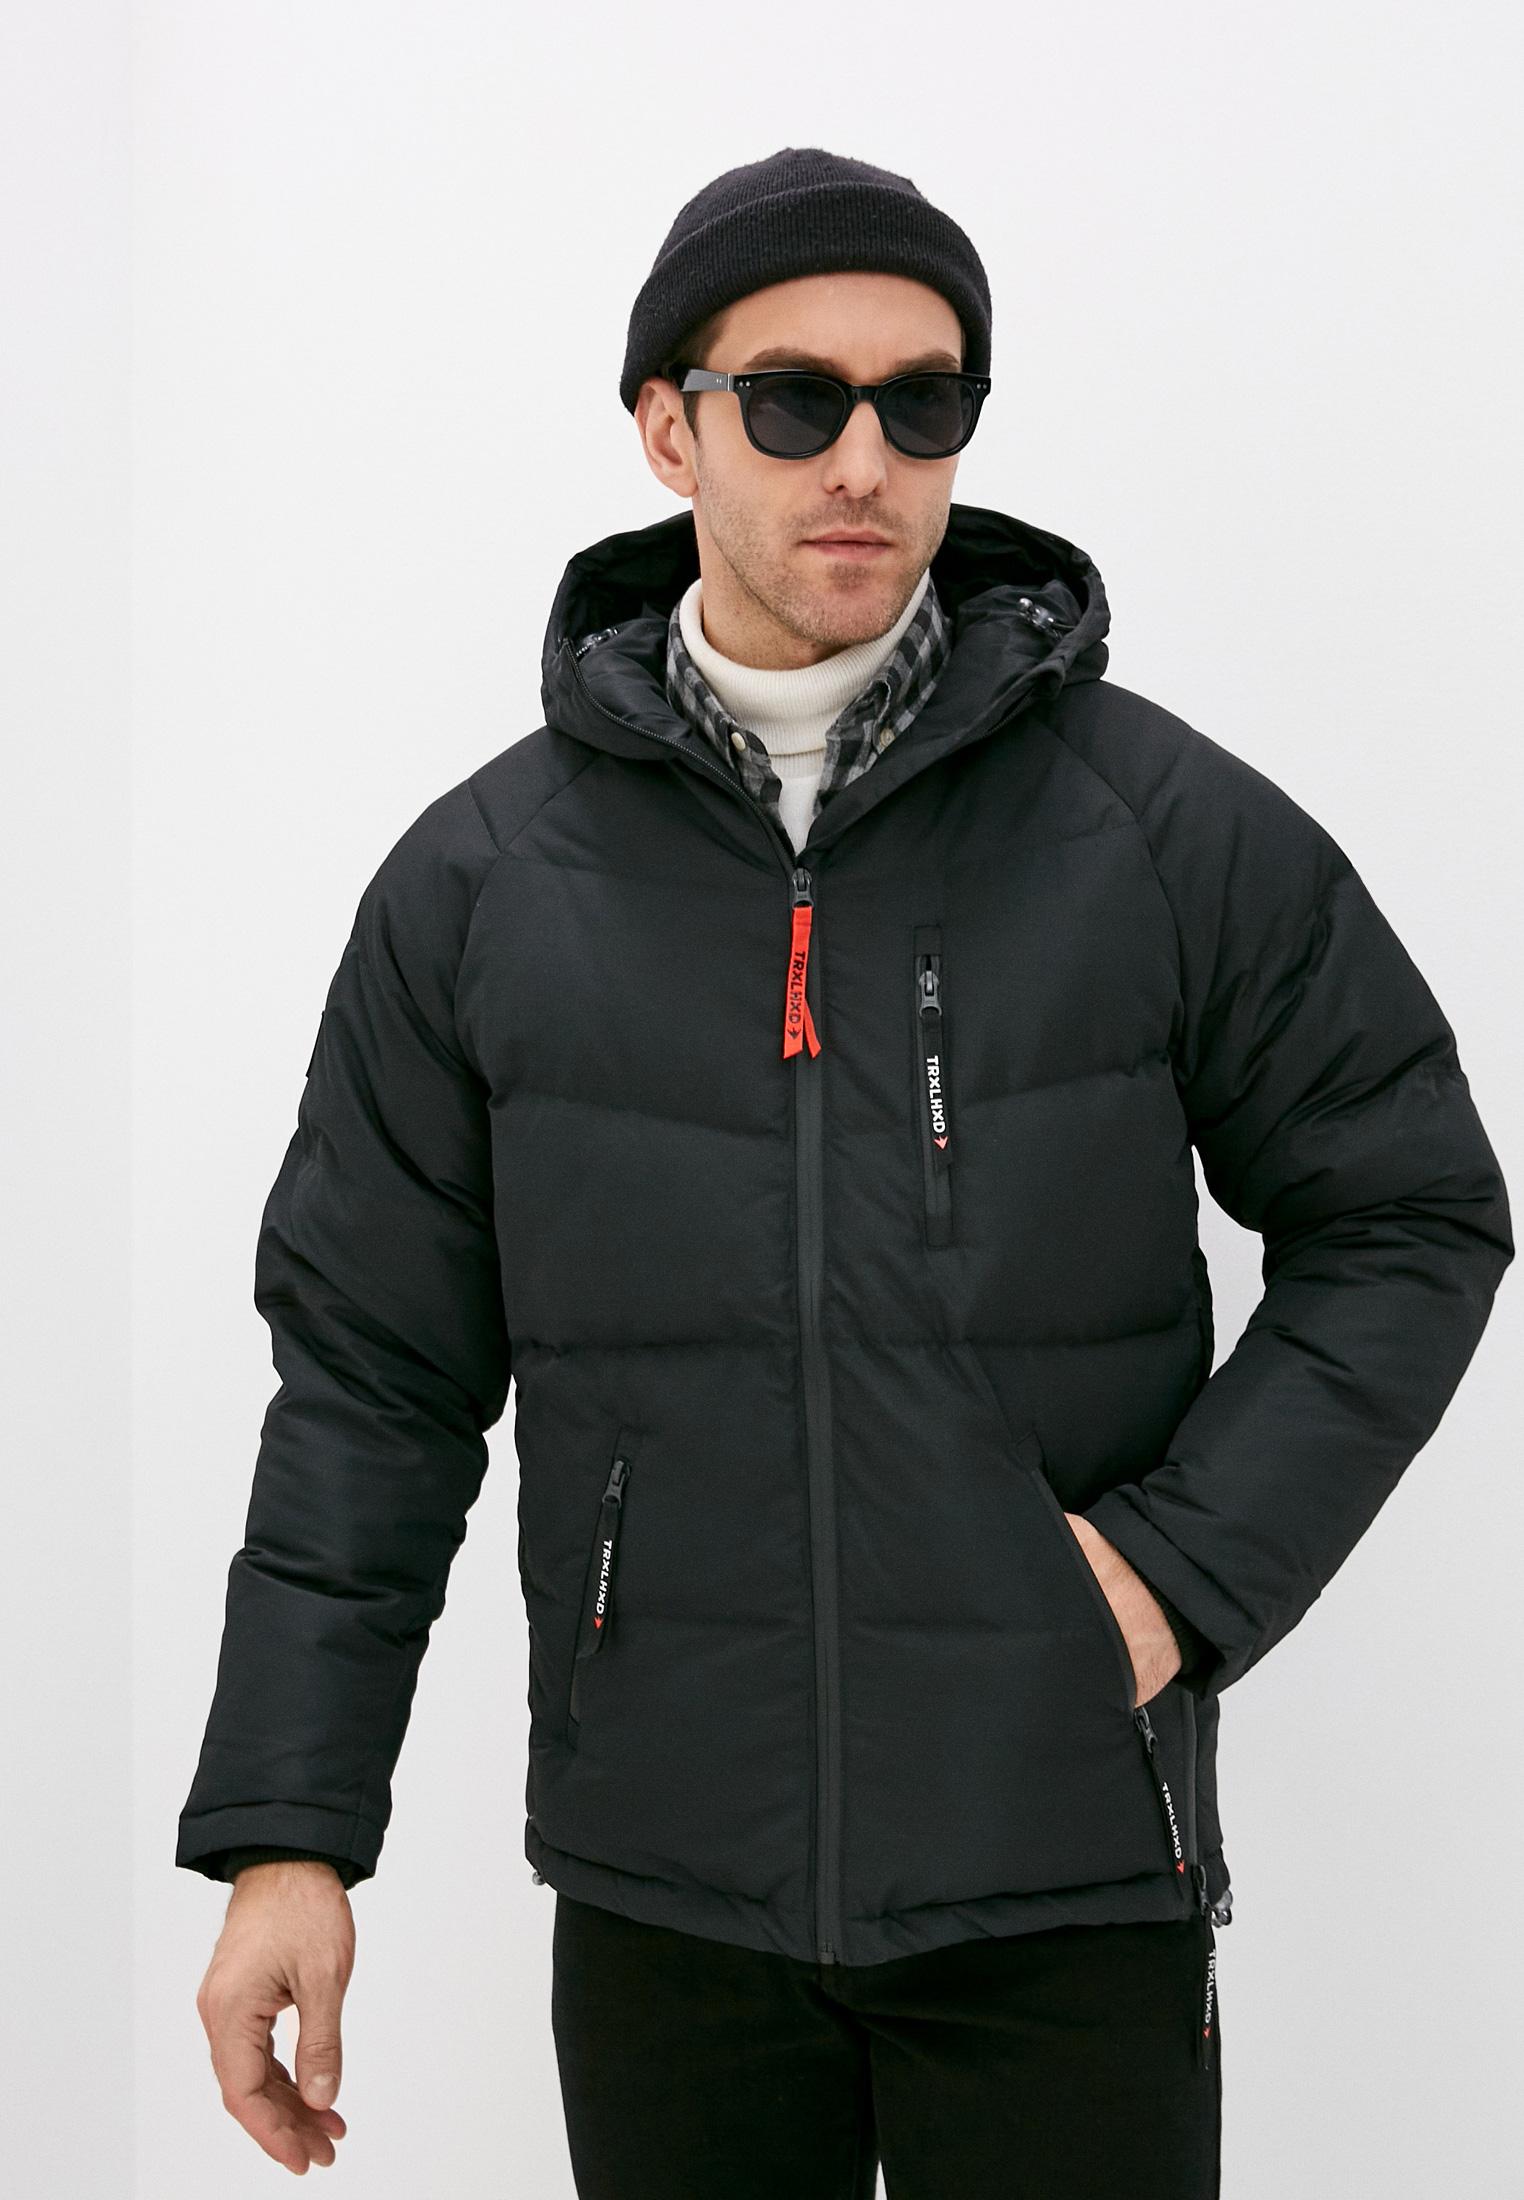 Мужская верхняя одежда Trailhead MJK530D